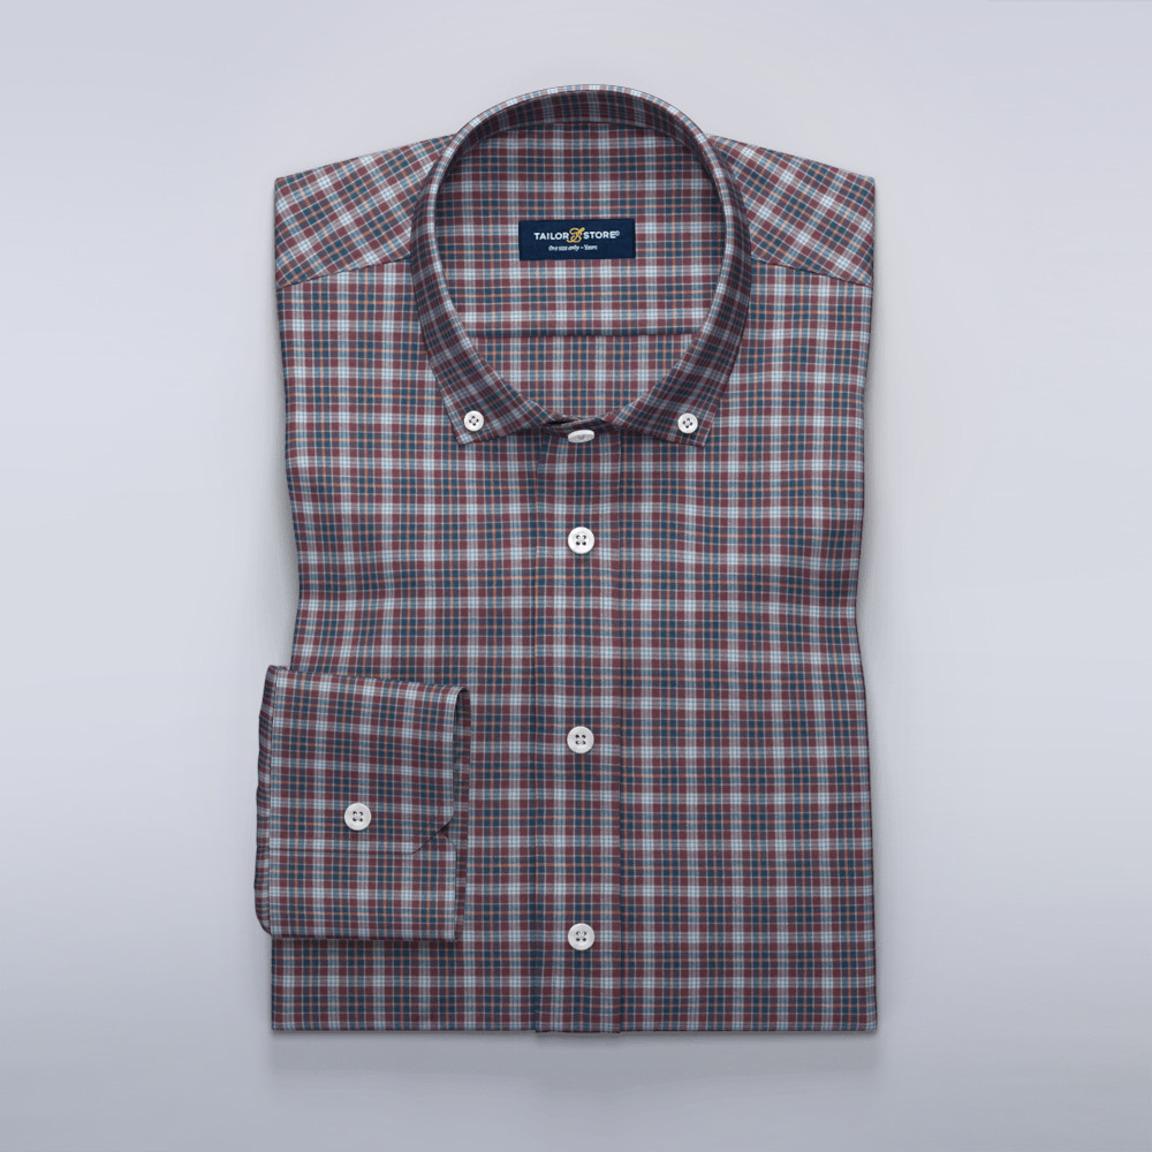 Rutig casual skjorta i twill